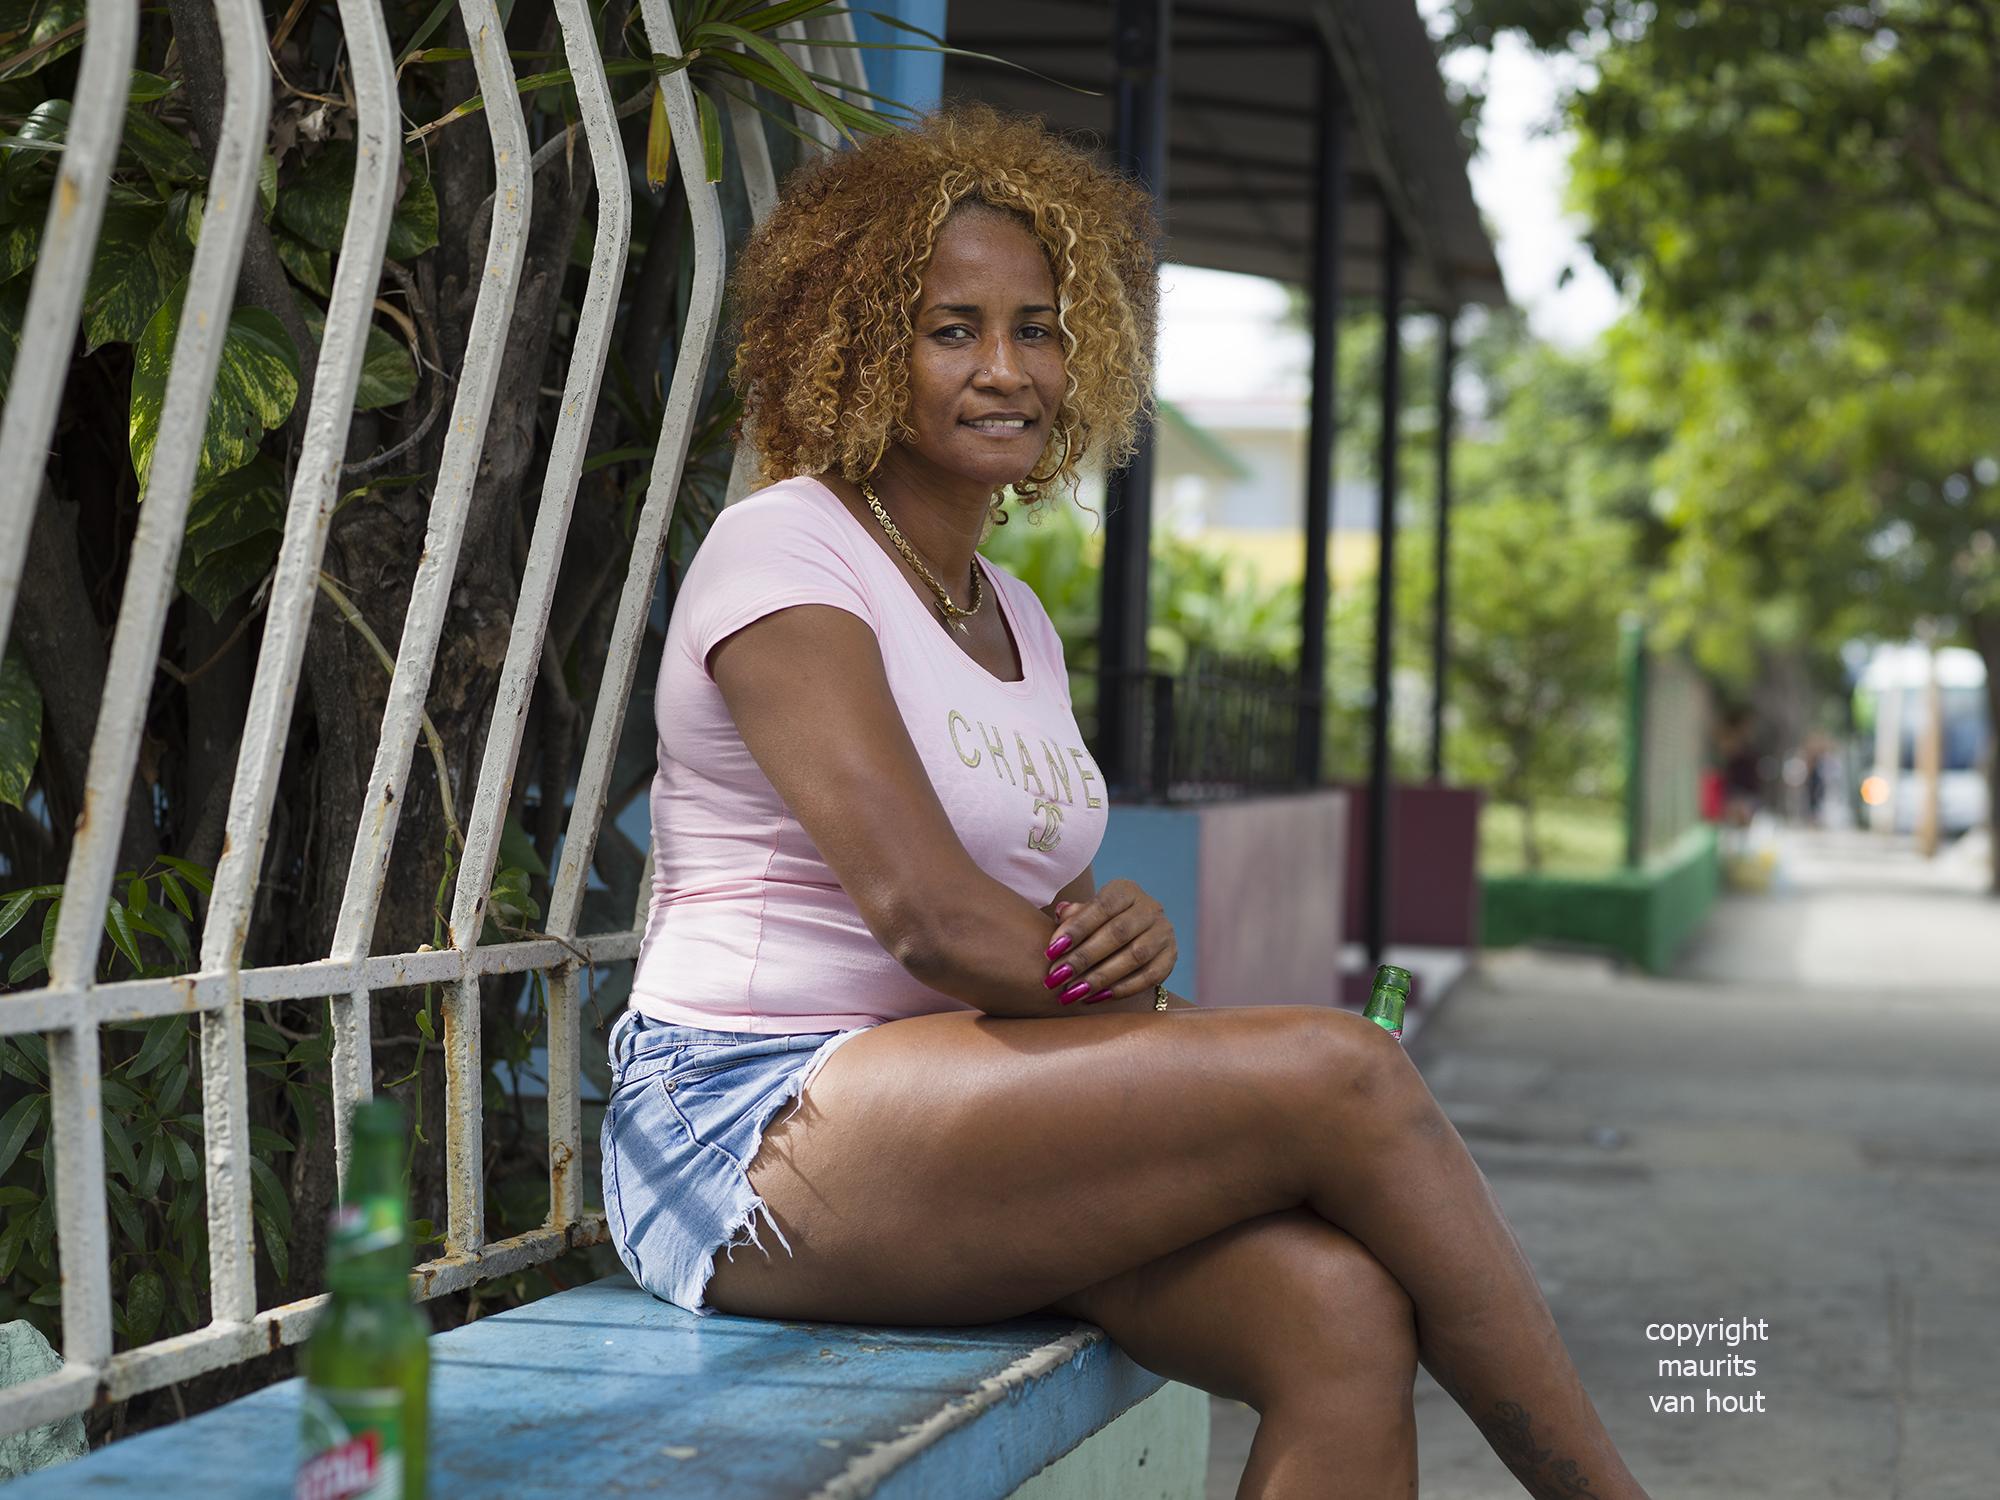 portrait of a woman, Varadero Cuba, by Dutch photographer Maurits van Hout